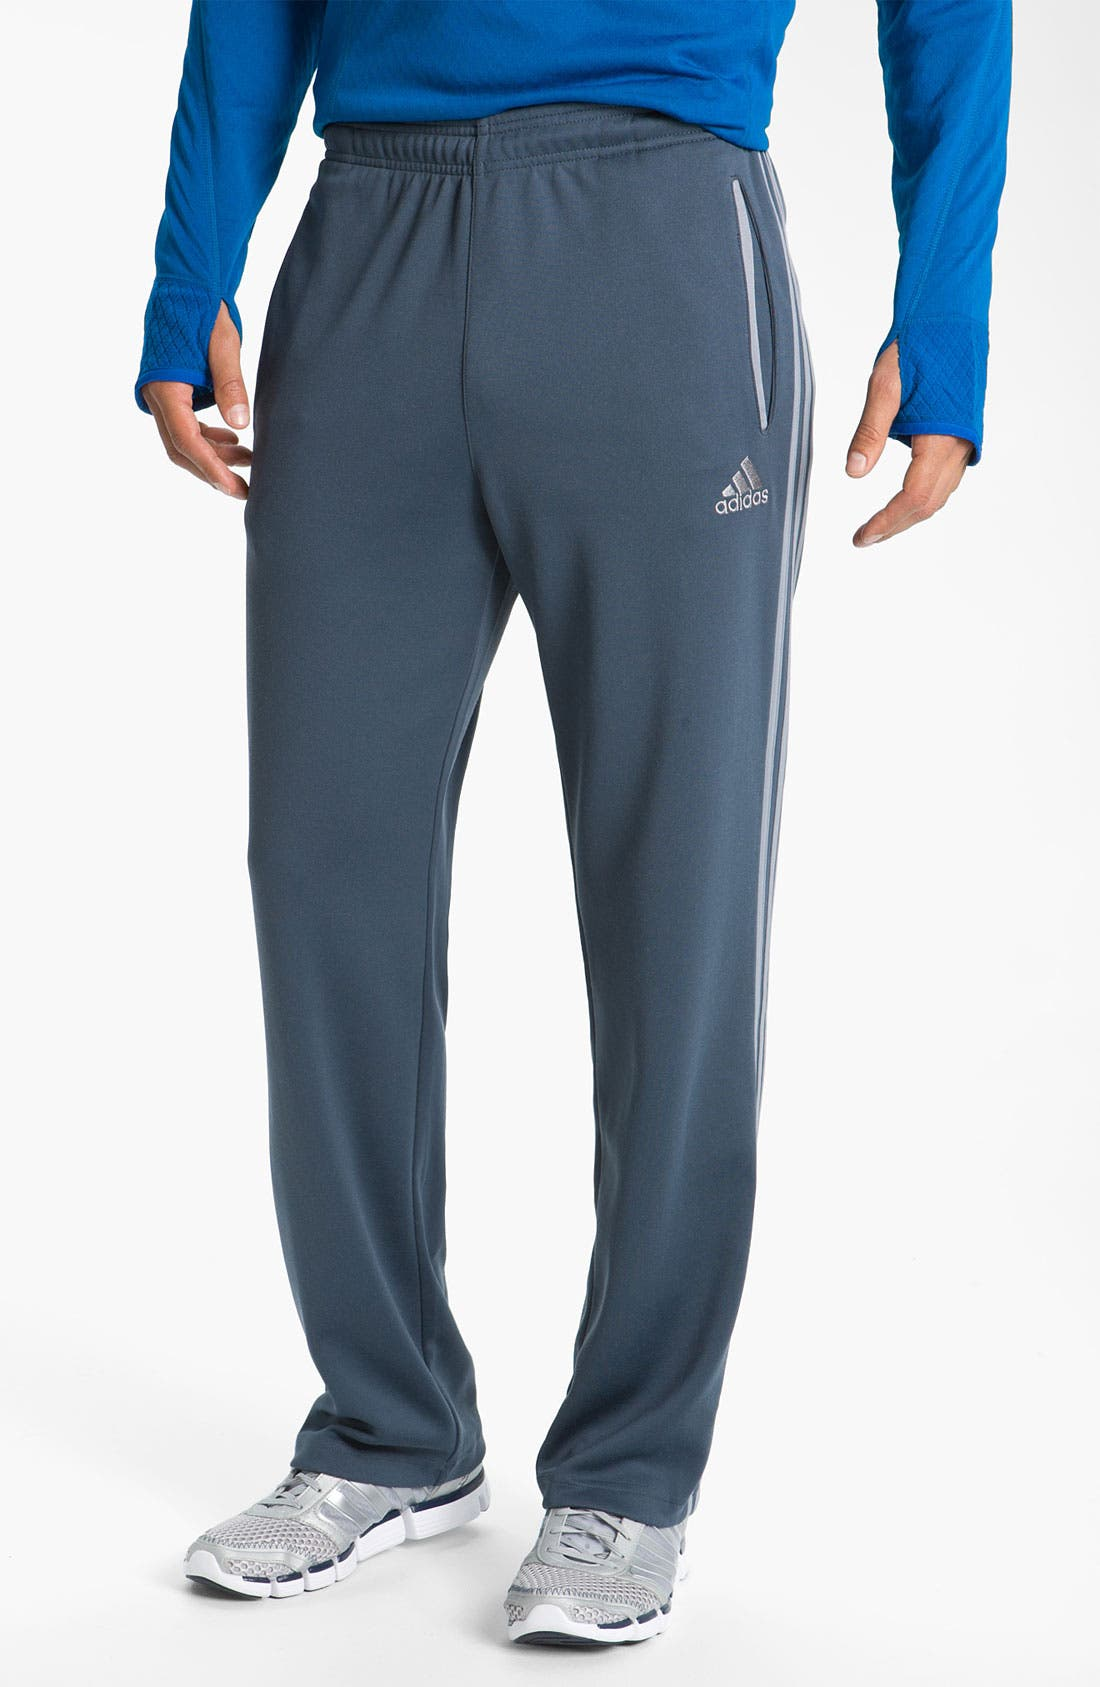 Main Image - adidas 'Ultimate' Track Pants